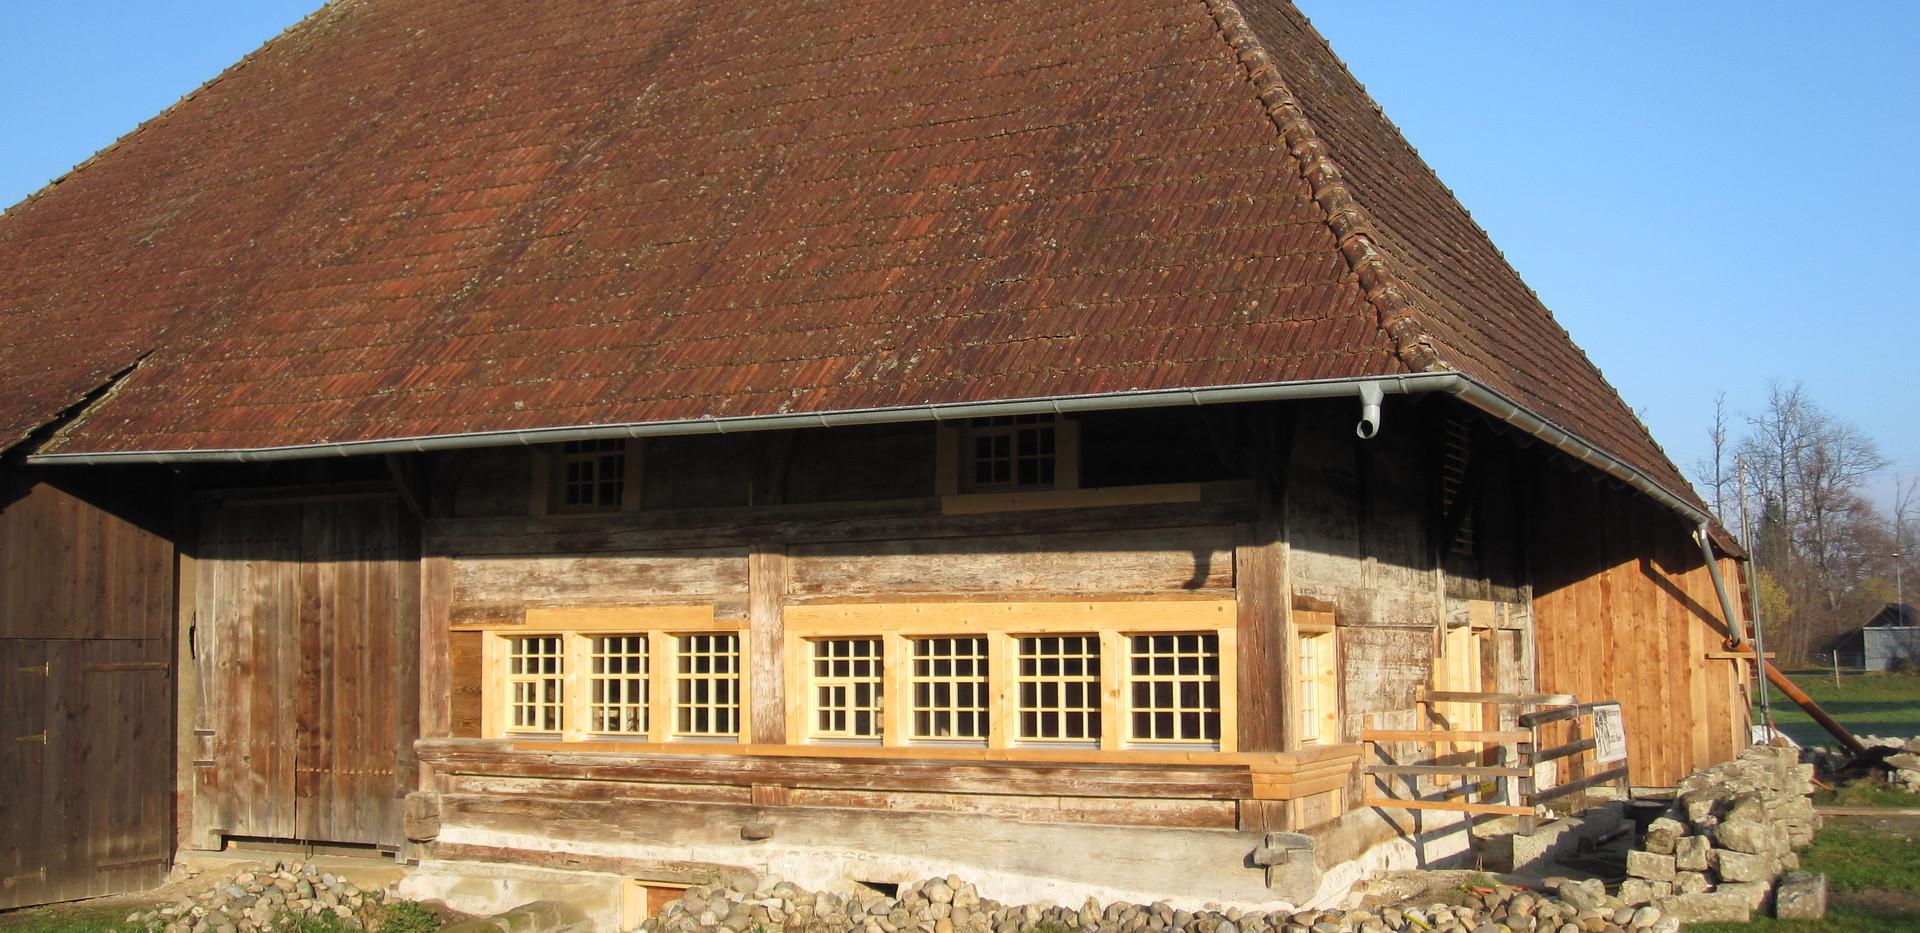 Hochstudhaus Staffelbach